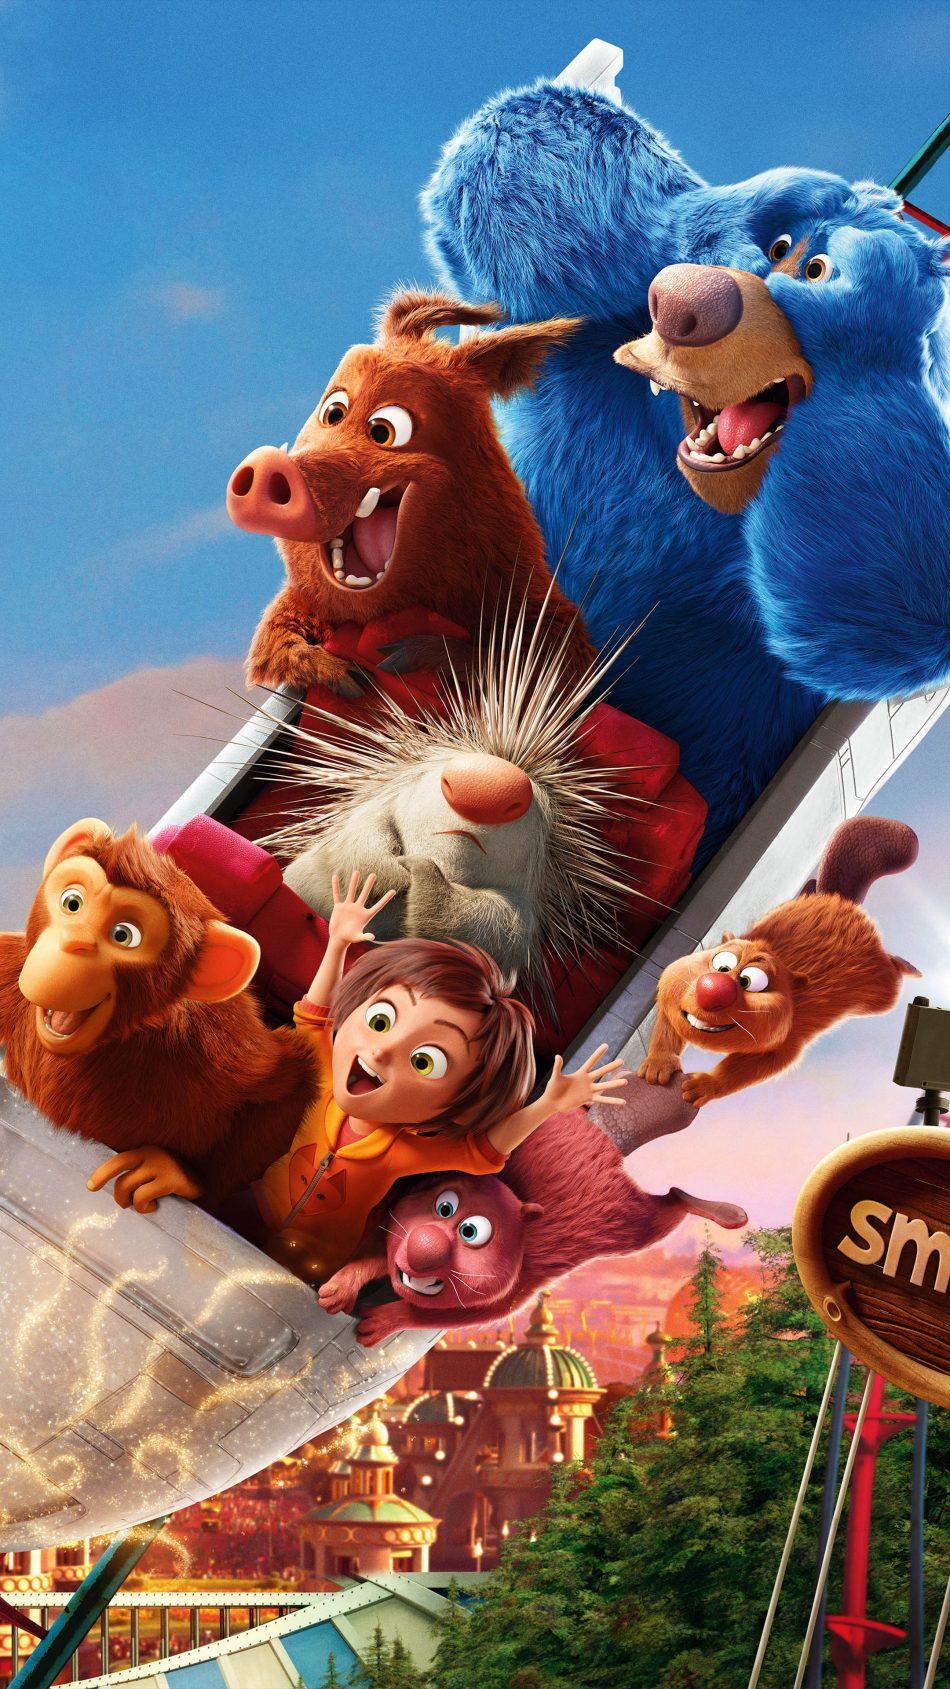 Wonder Park Animation 2019 Adventure Comedy 4K Ultra HD Mobile Wallpaper